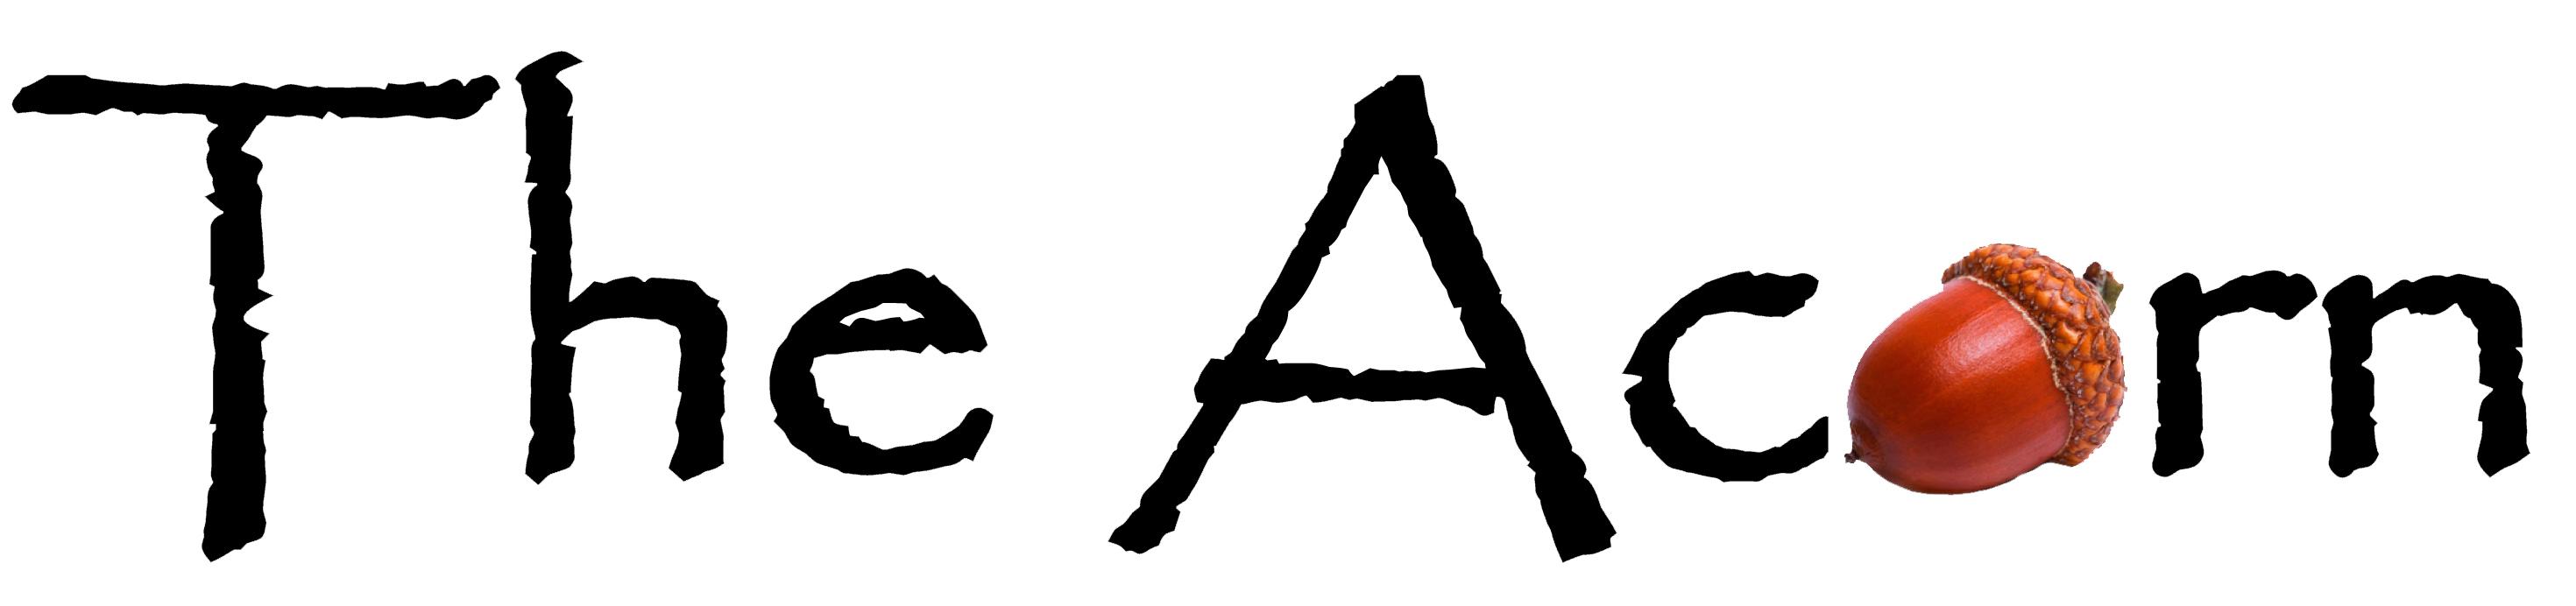 acornmastheadnew1